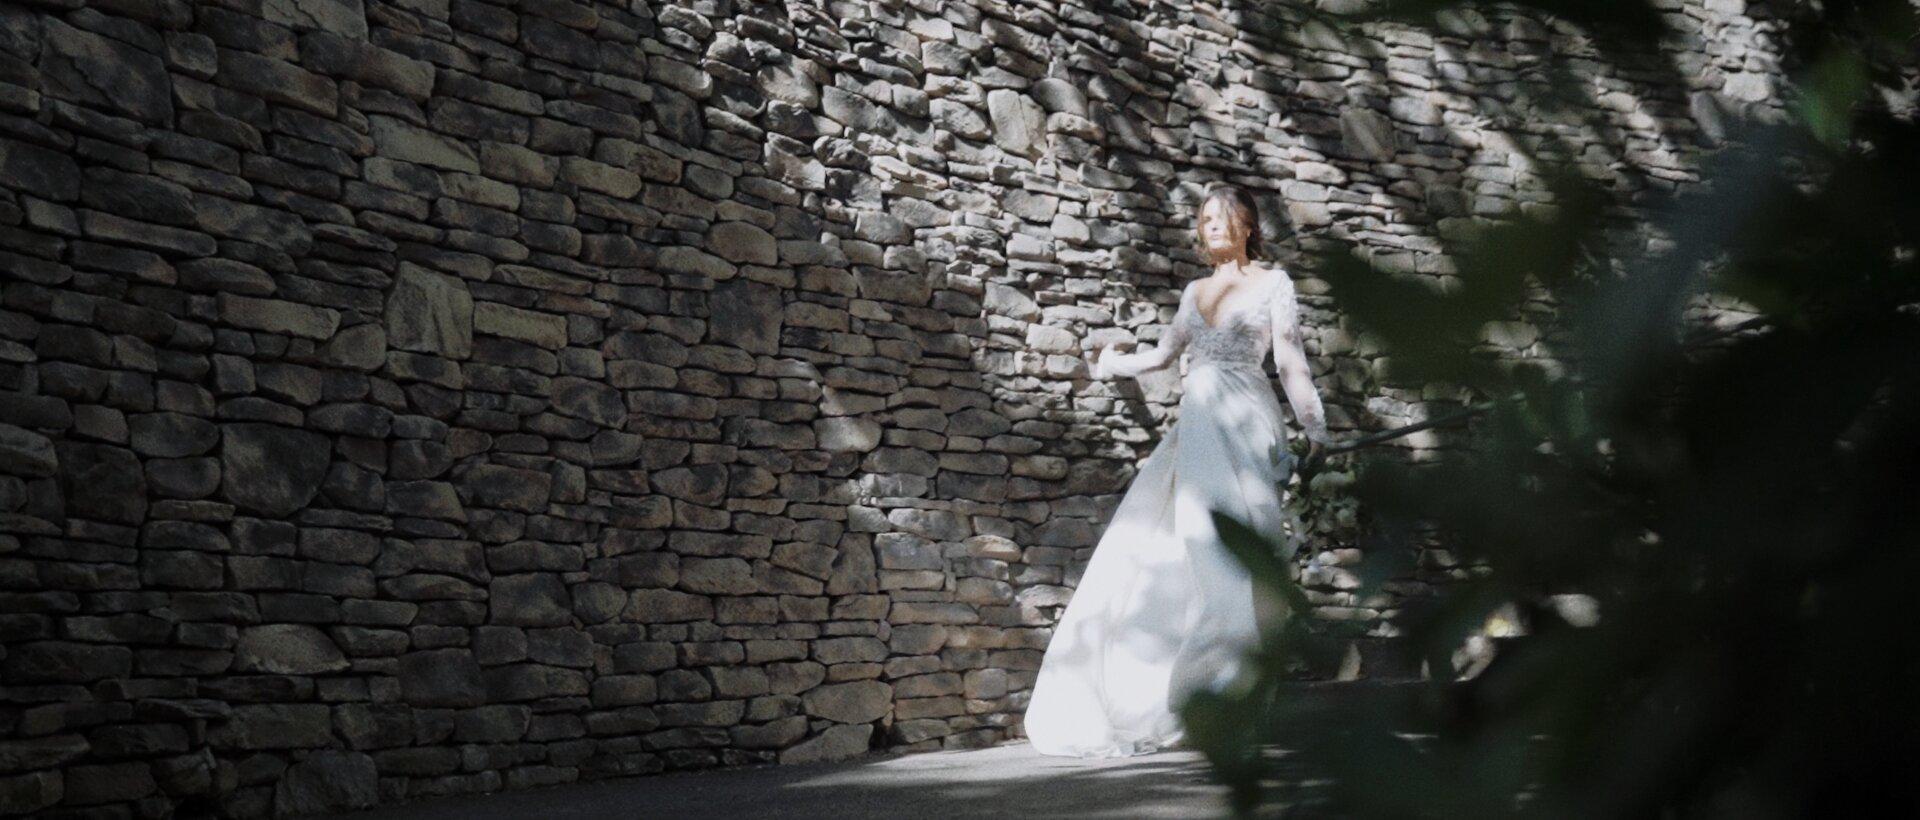 bride walking by Montage Kapalua stone wall